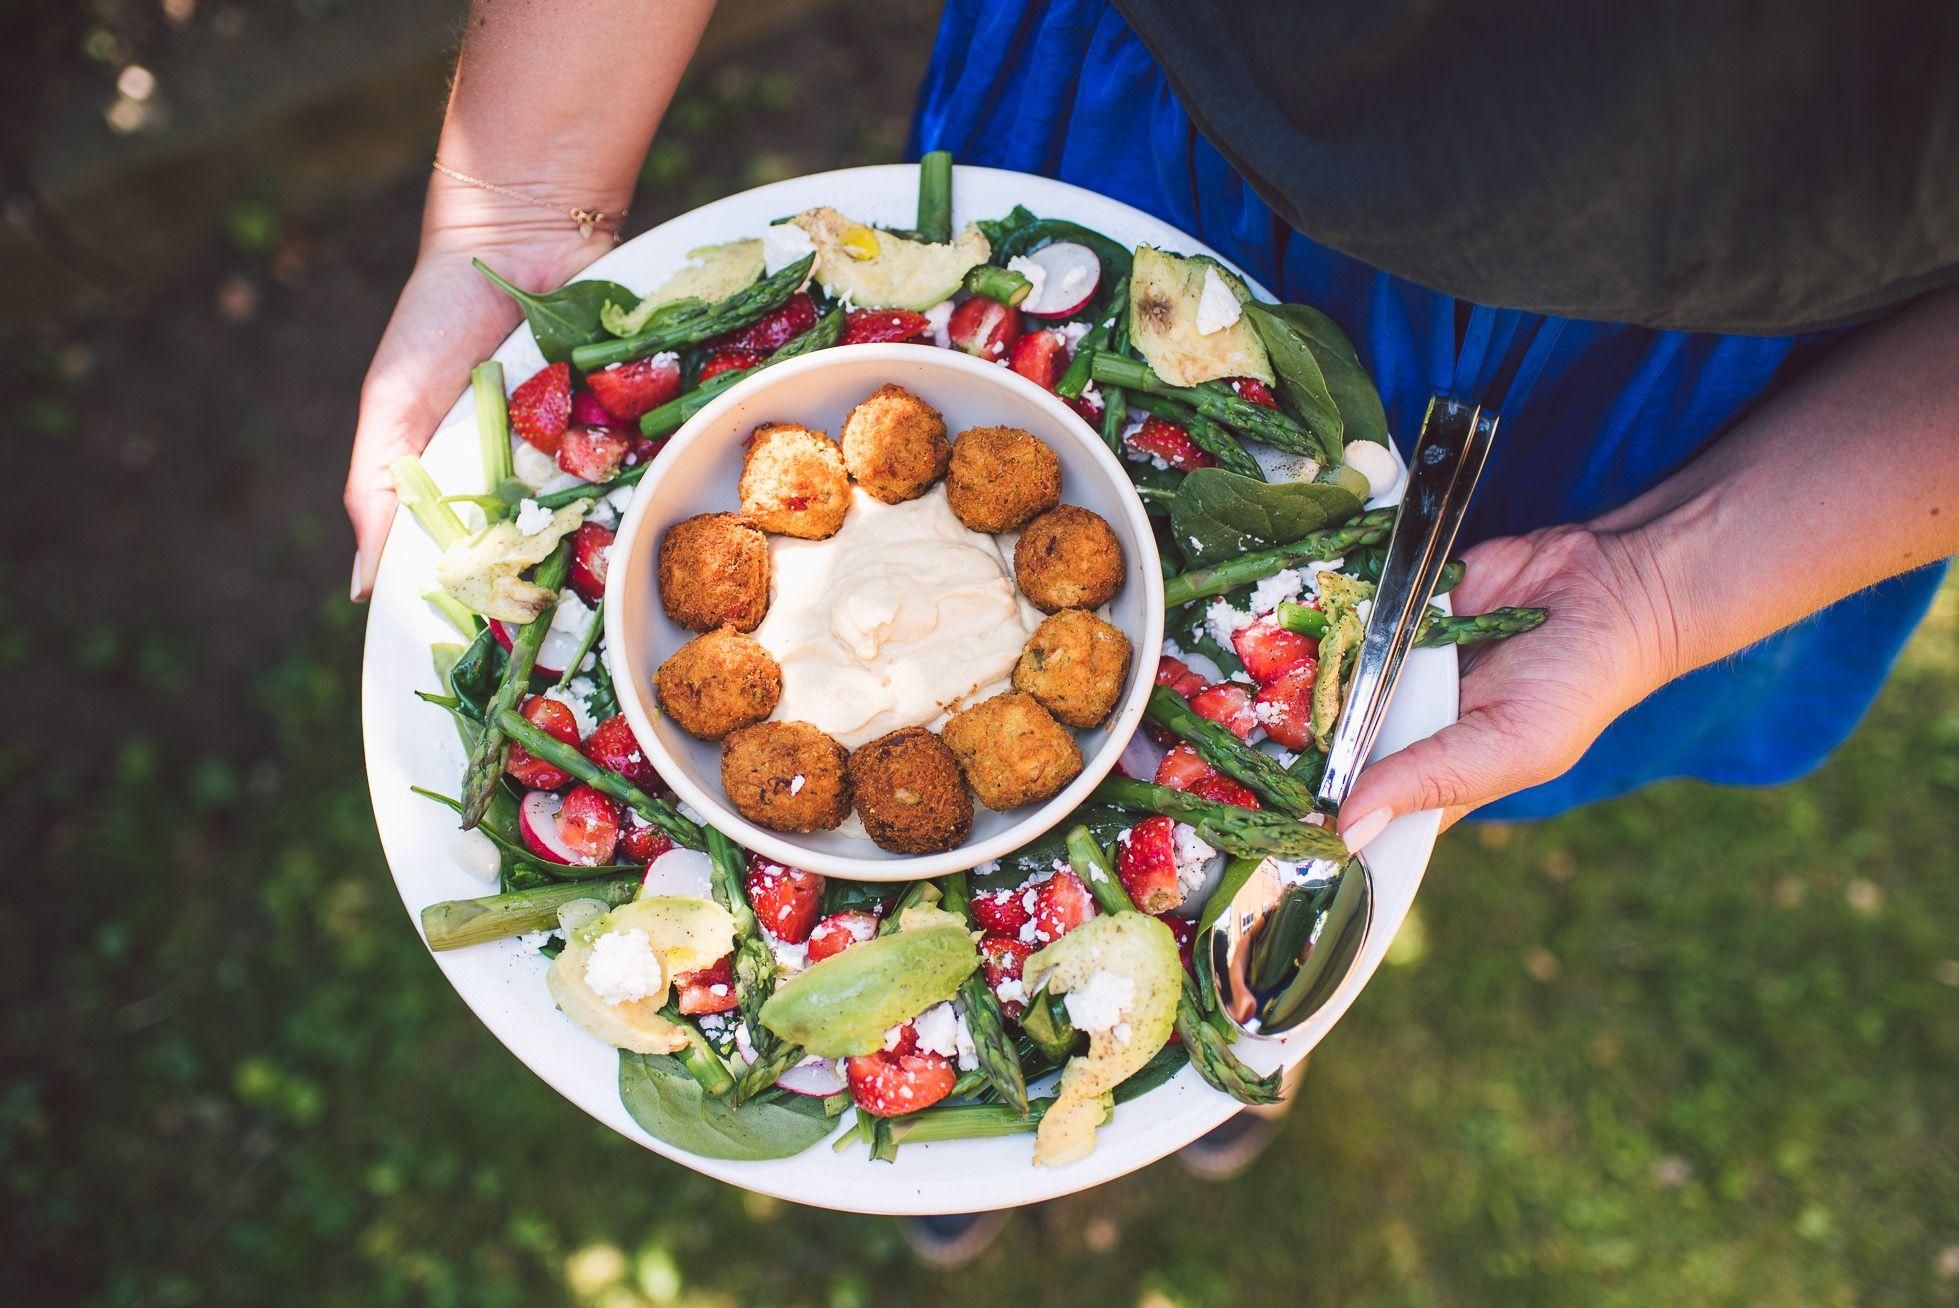 falafel,hummus, strawberries, asparagus, spinach, avocado, feta